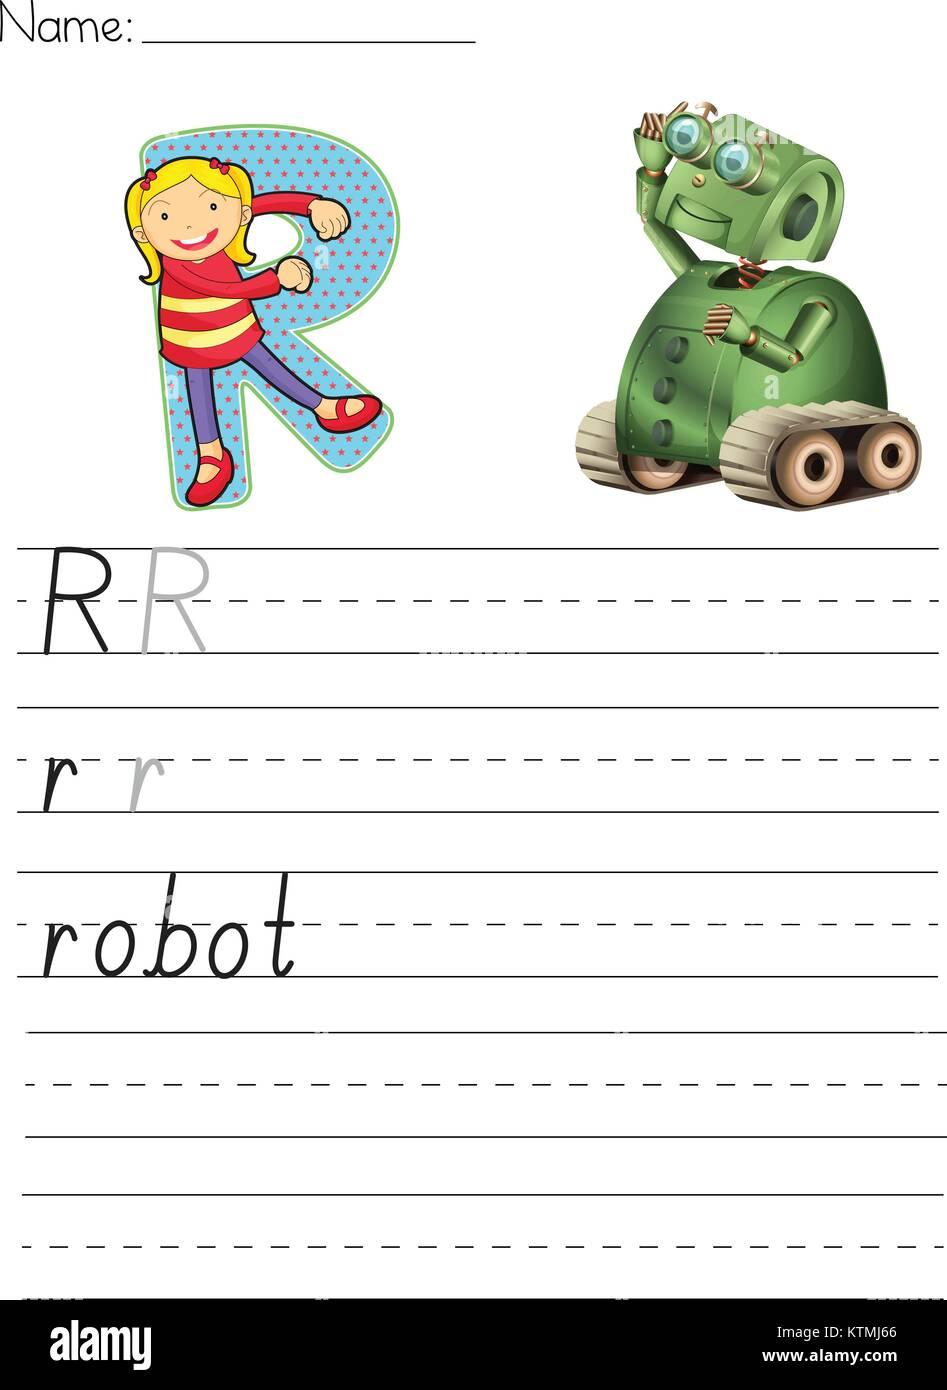 Alphabet Arbeitsblatt der Buchstabe R Vektor Abbildung - Bild ...